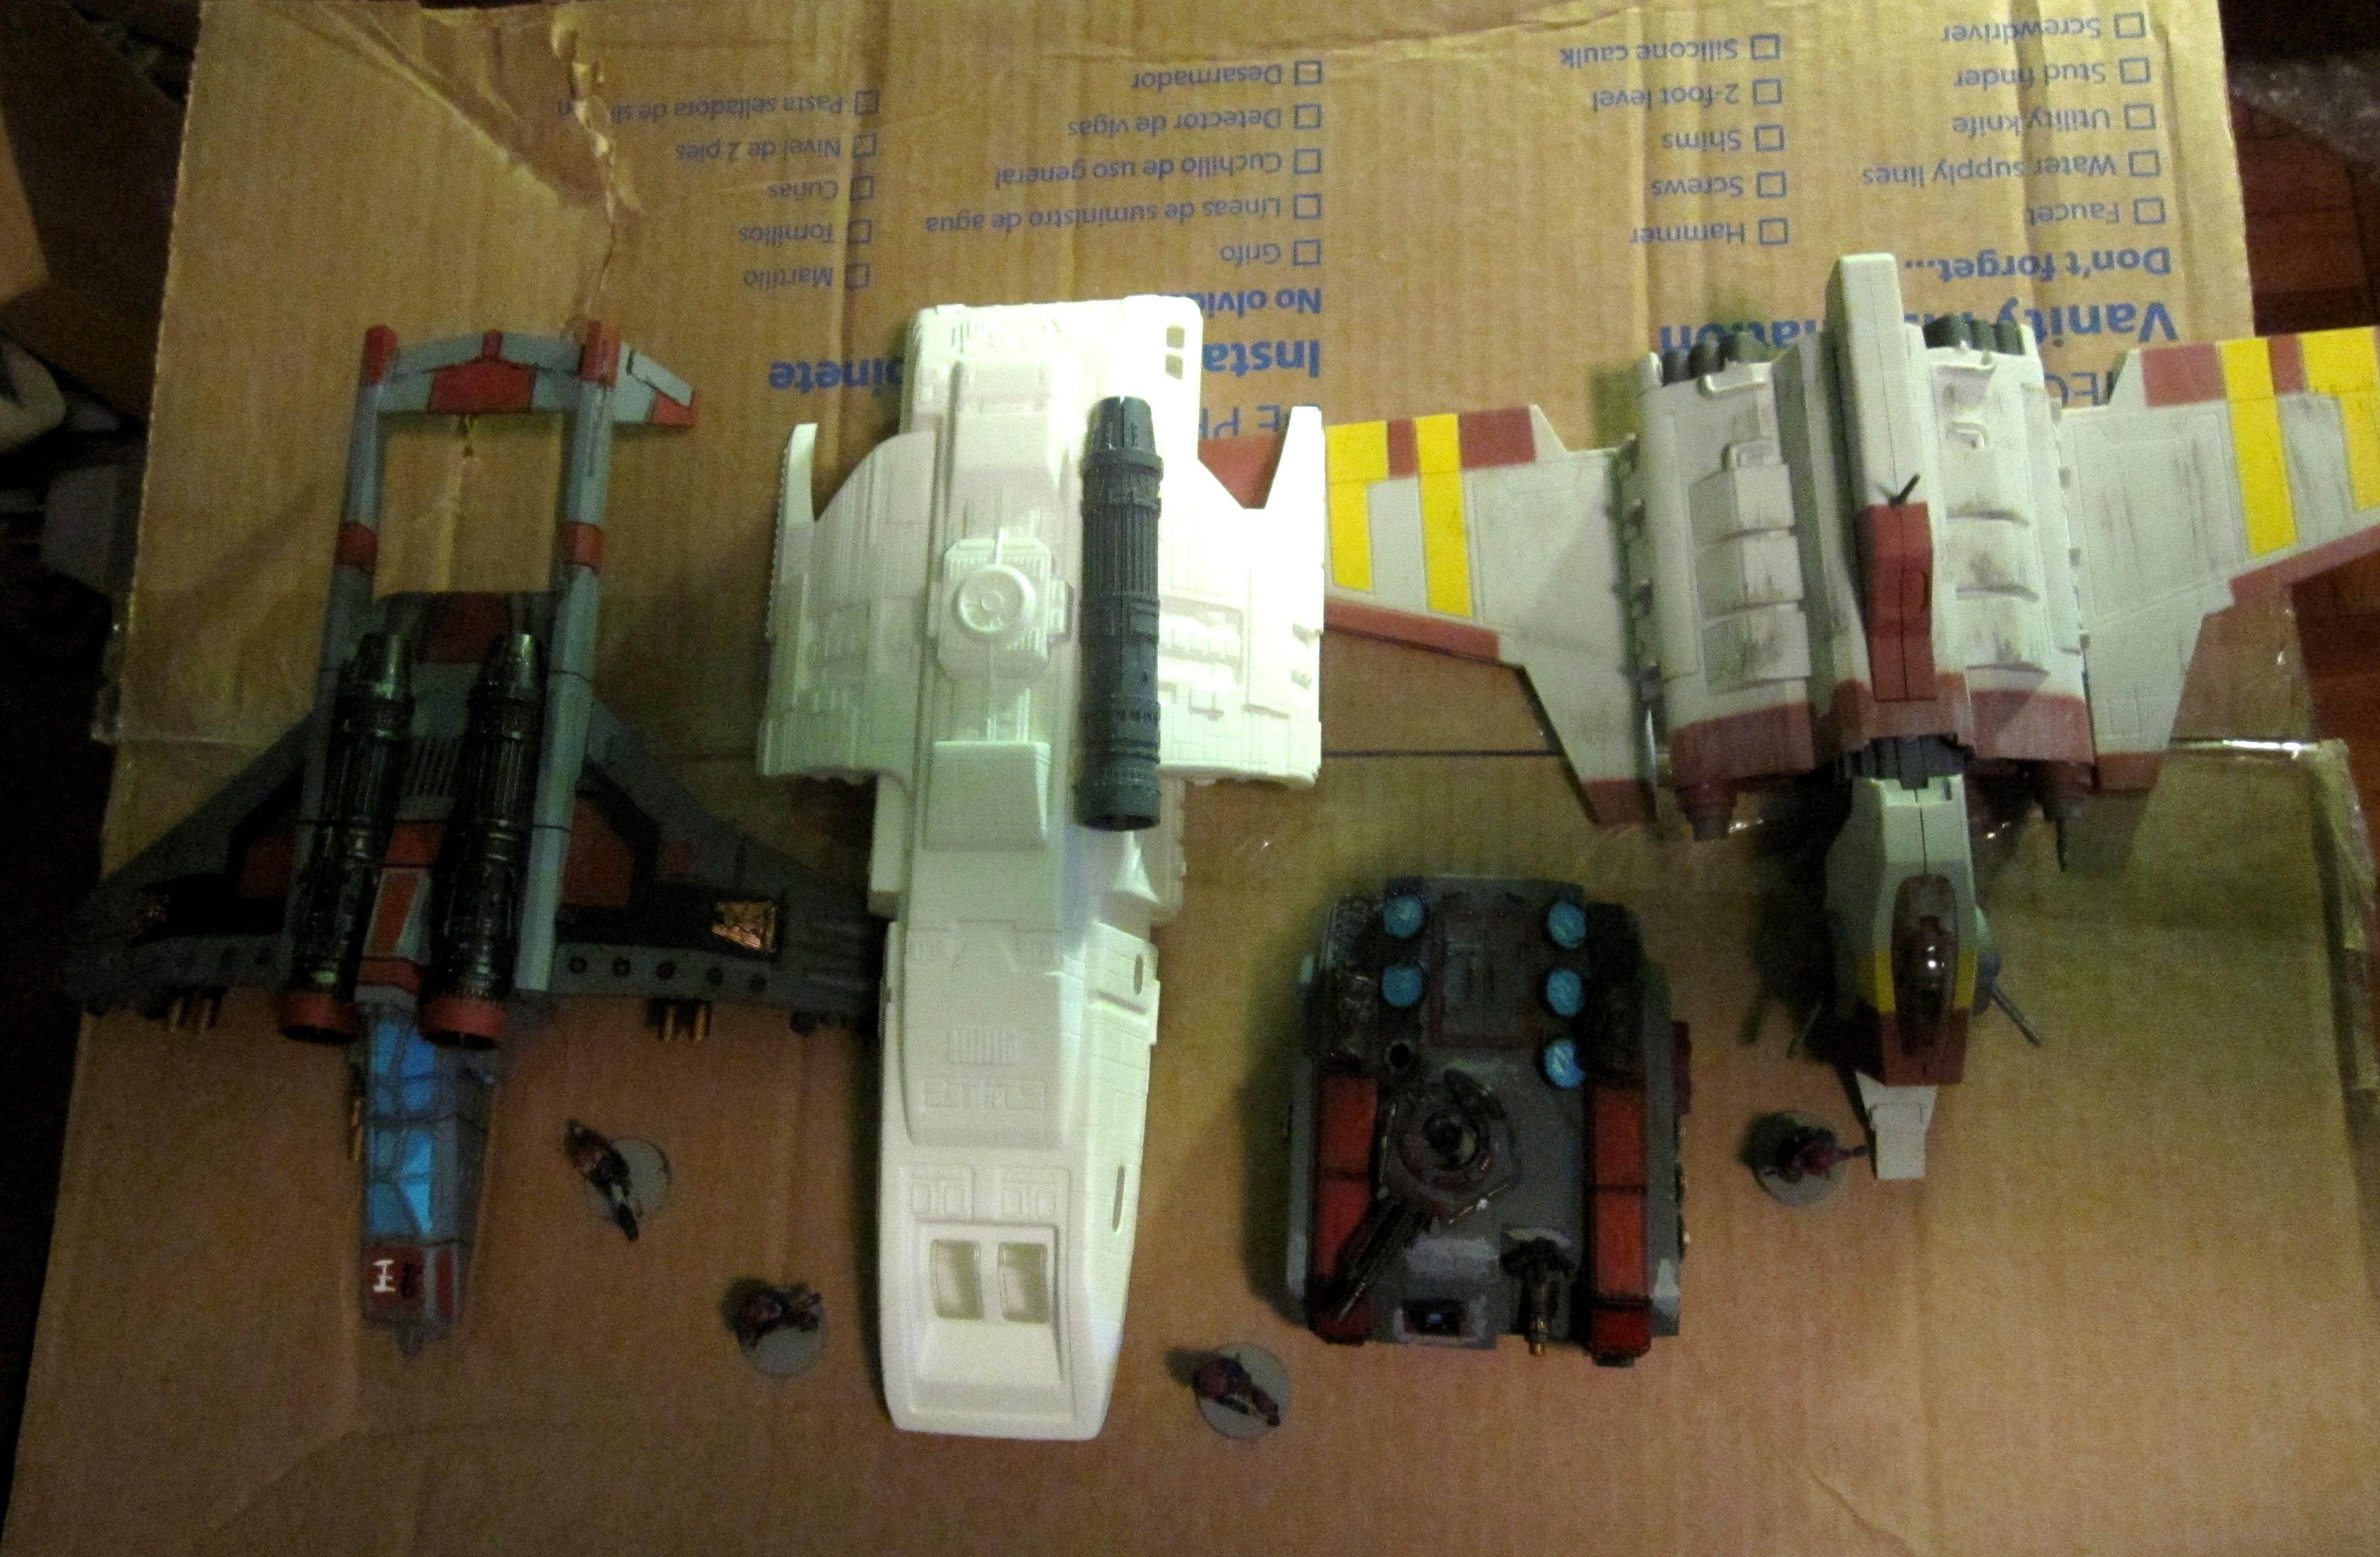 Flyer, Guncutter, Lander, Lighter, Runabout, Shuttle, Star Trek, Star Wars, Storm Raven